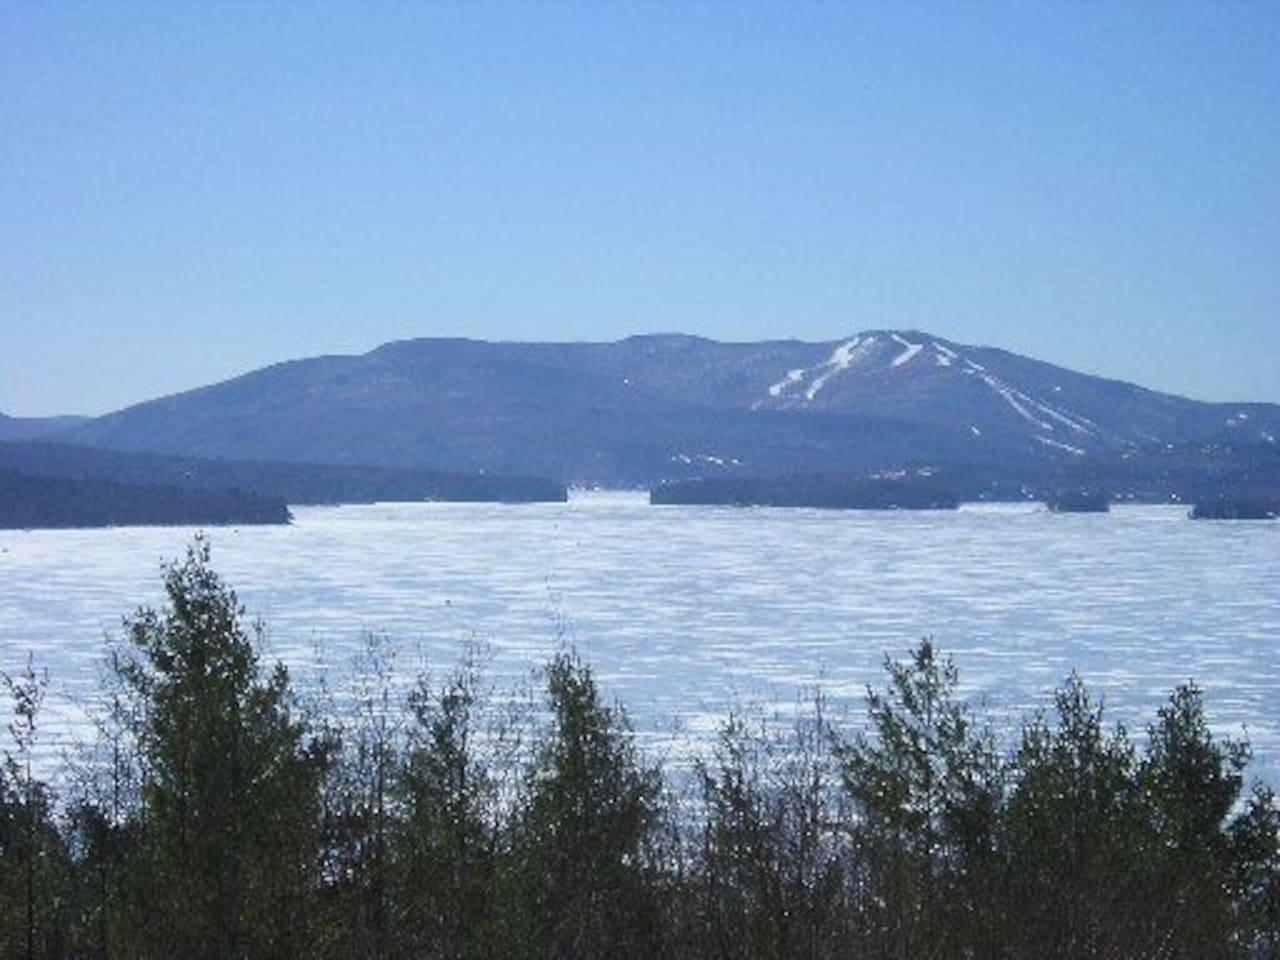 Three miles from Mount Sunapee